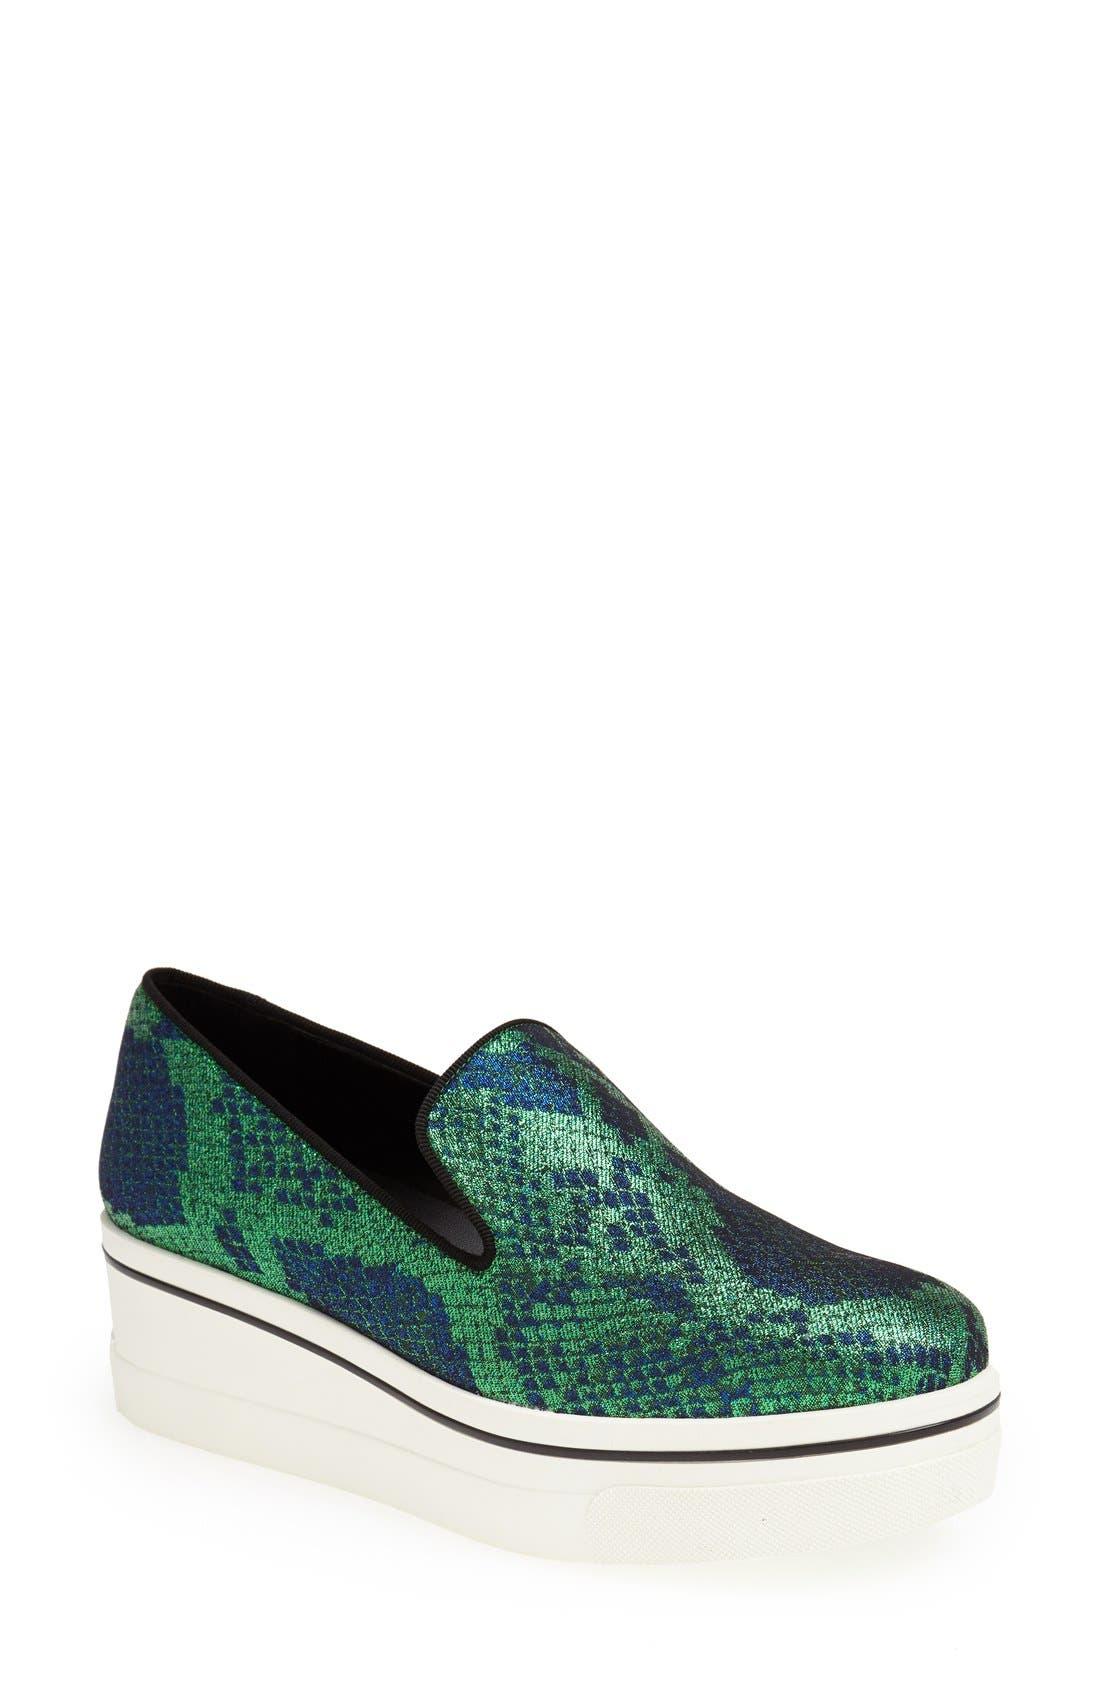 Alternate Image 1 Selected - Stella McCartney Python Print Platform Slip-On Sneaker (Women)